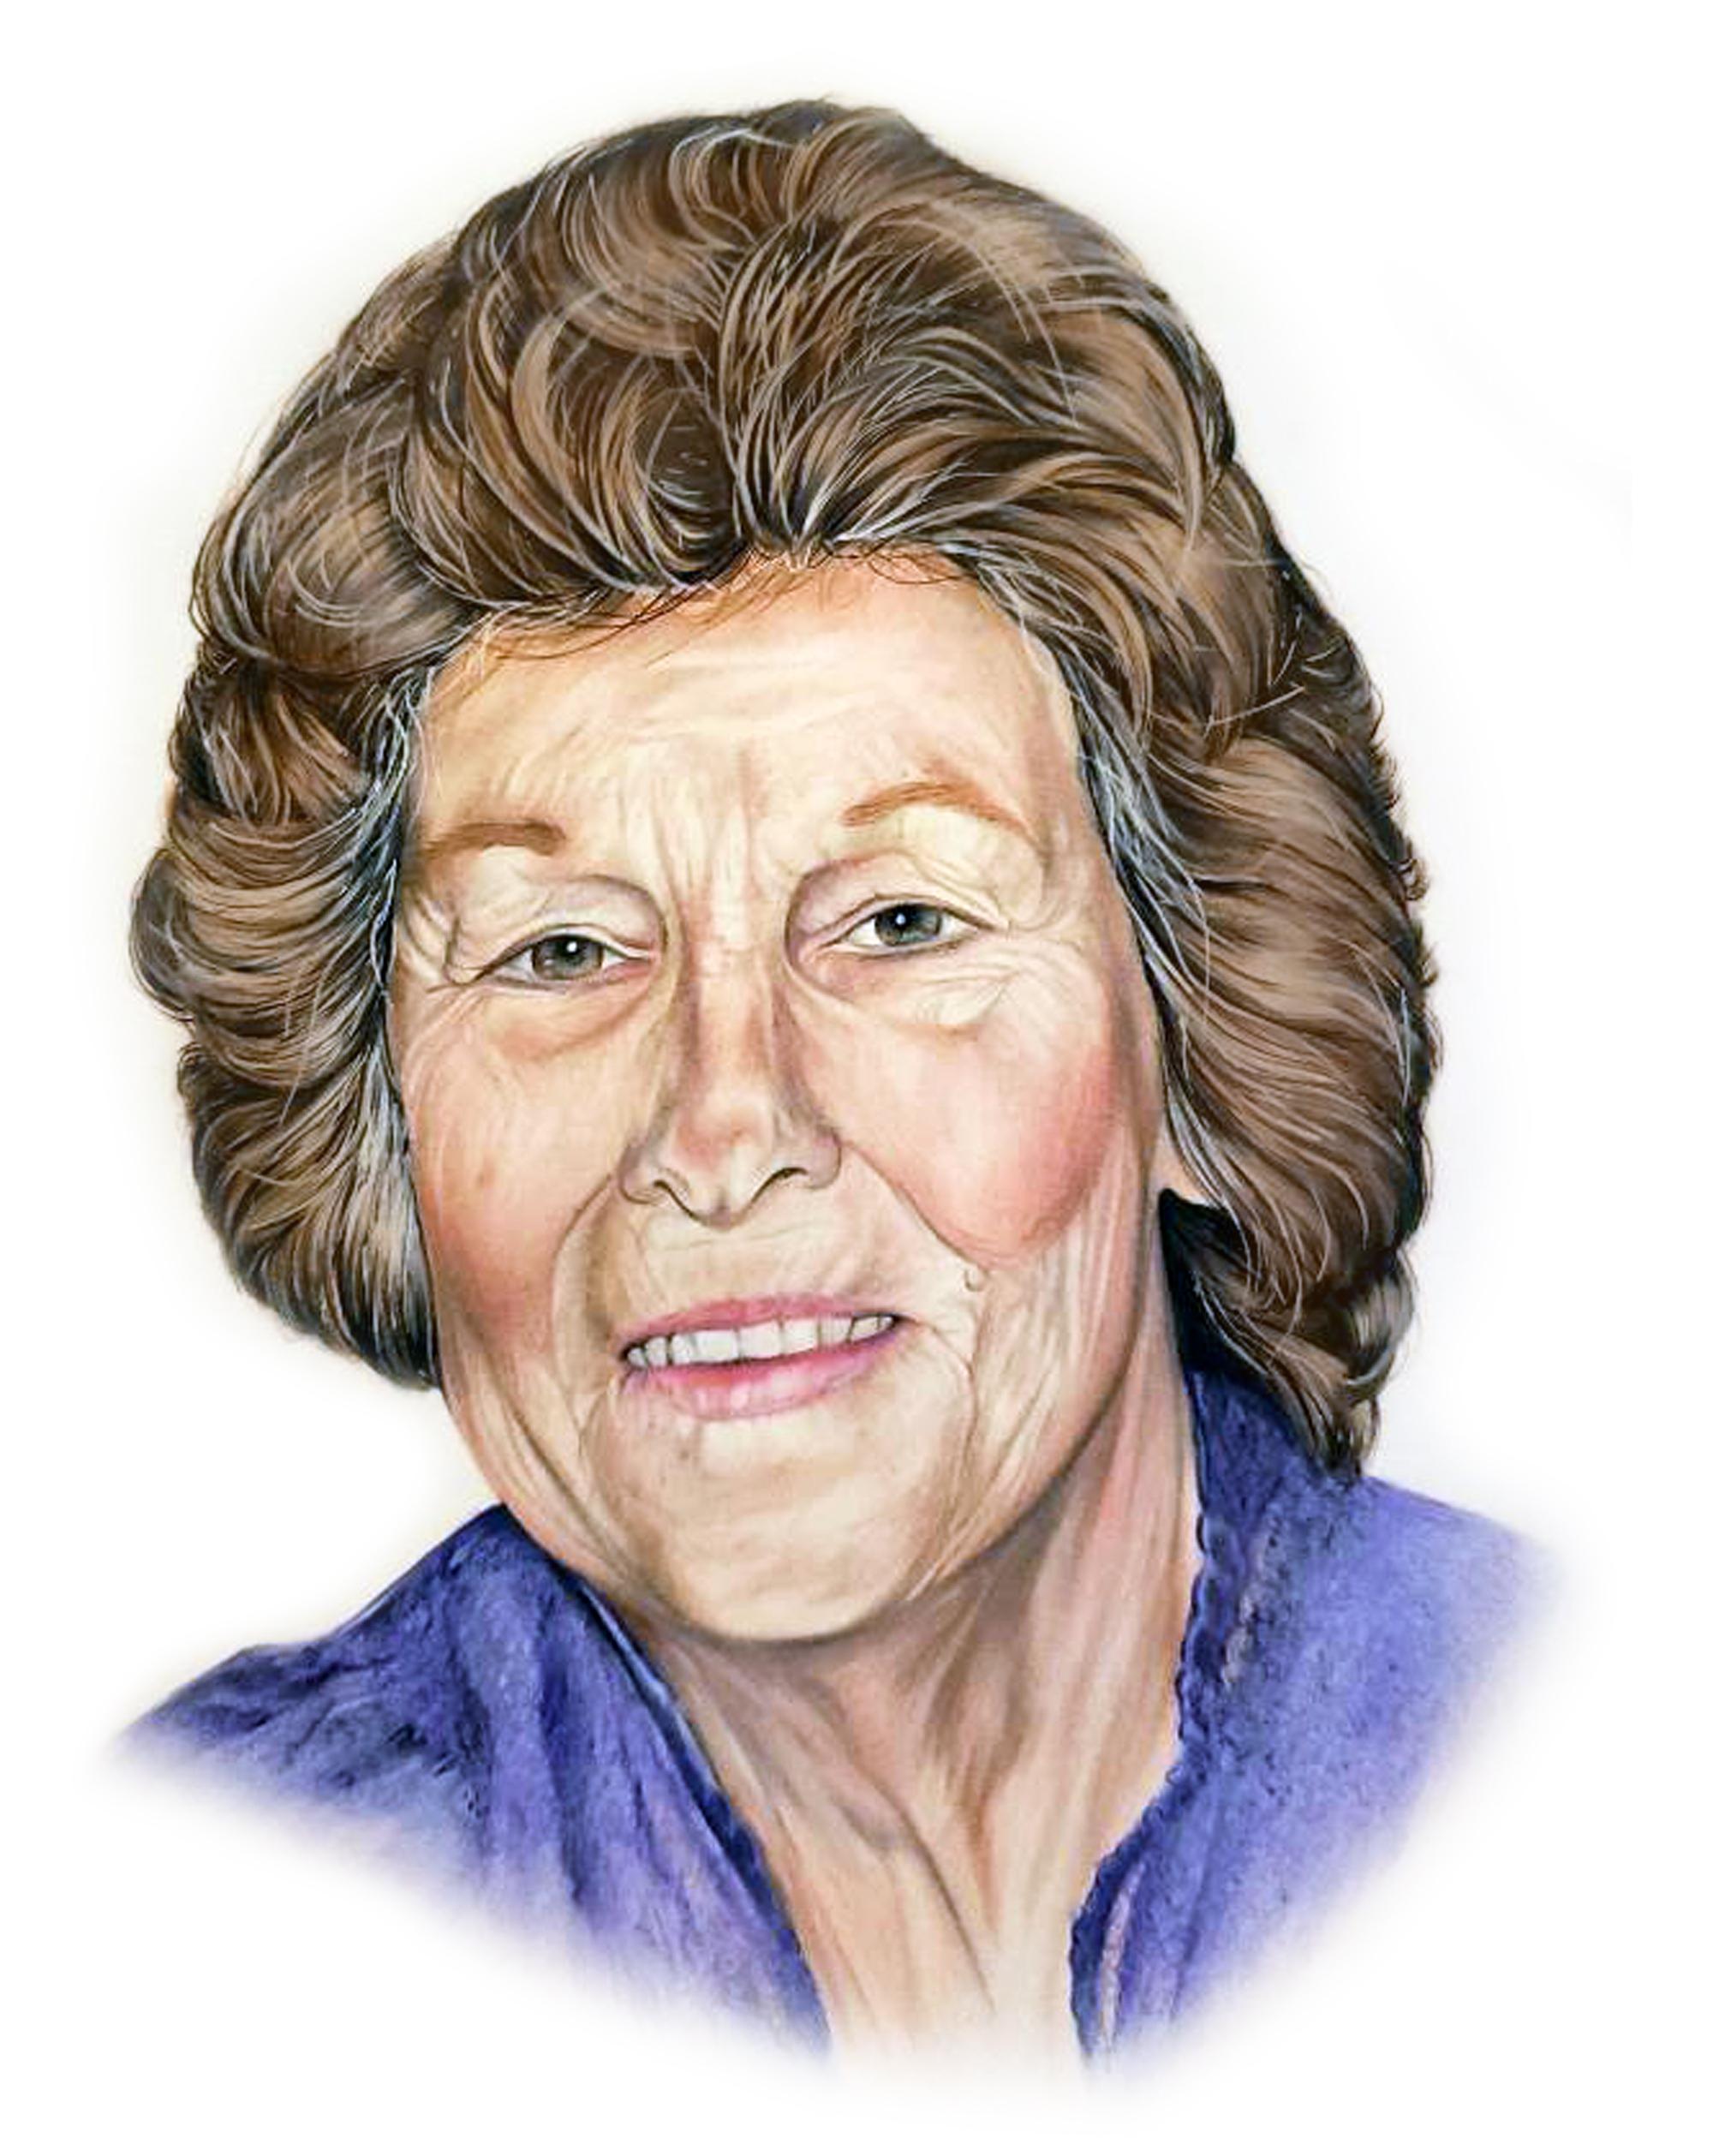 photorealistic drawing of grandma, super detailed portrait of a woman, portrait of grandma, memorial